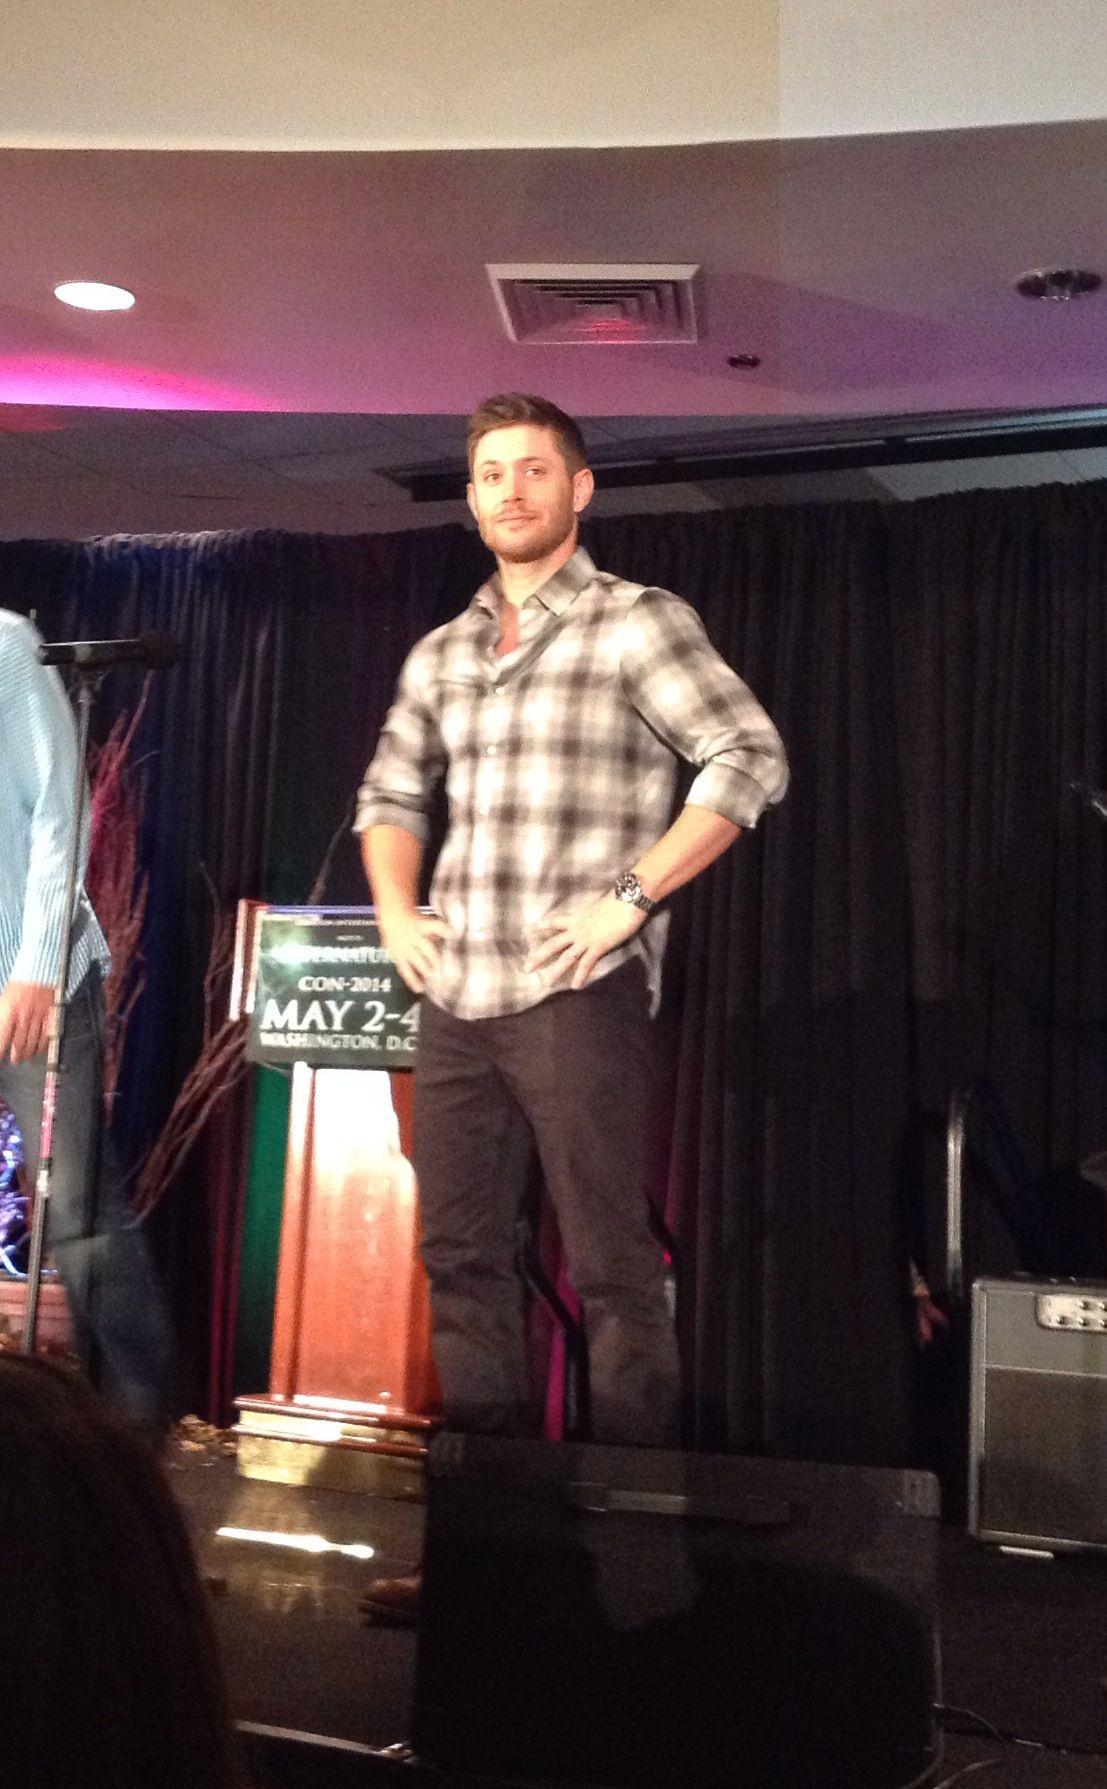 Just look at him!  Gah!!!   #JensenAckles  #DCCon2014